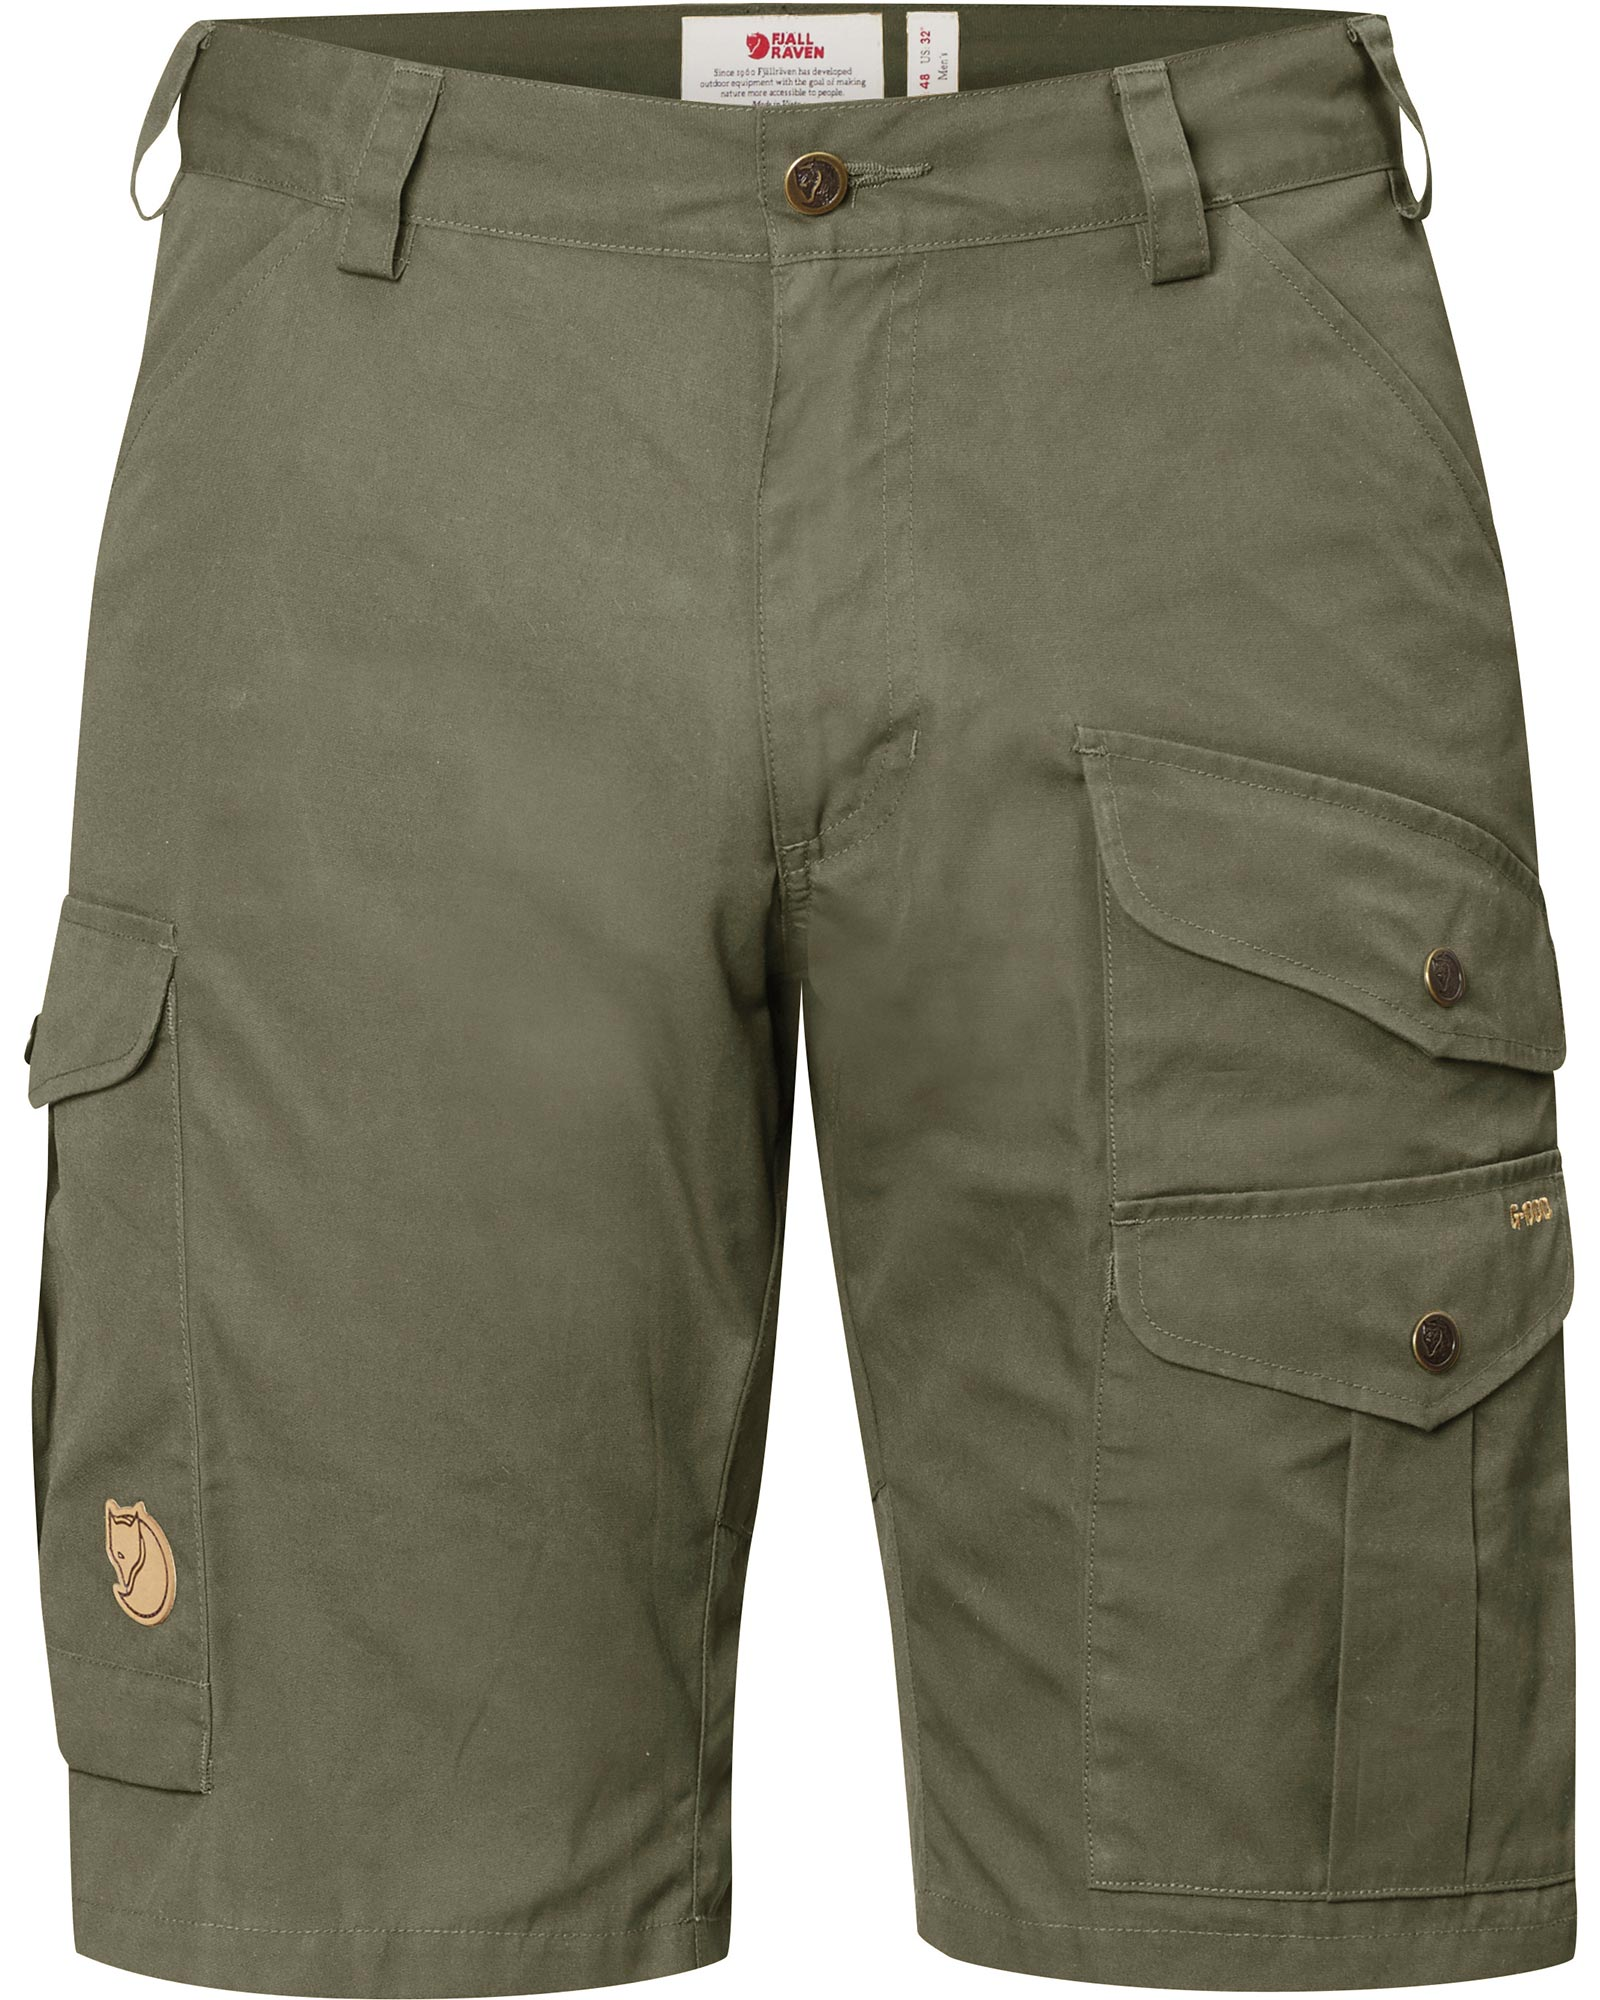 Product image of Fjallraven Men's Barents Pro G-1000 Shorts